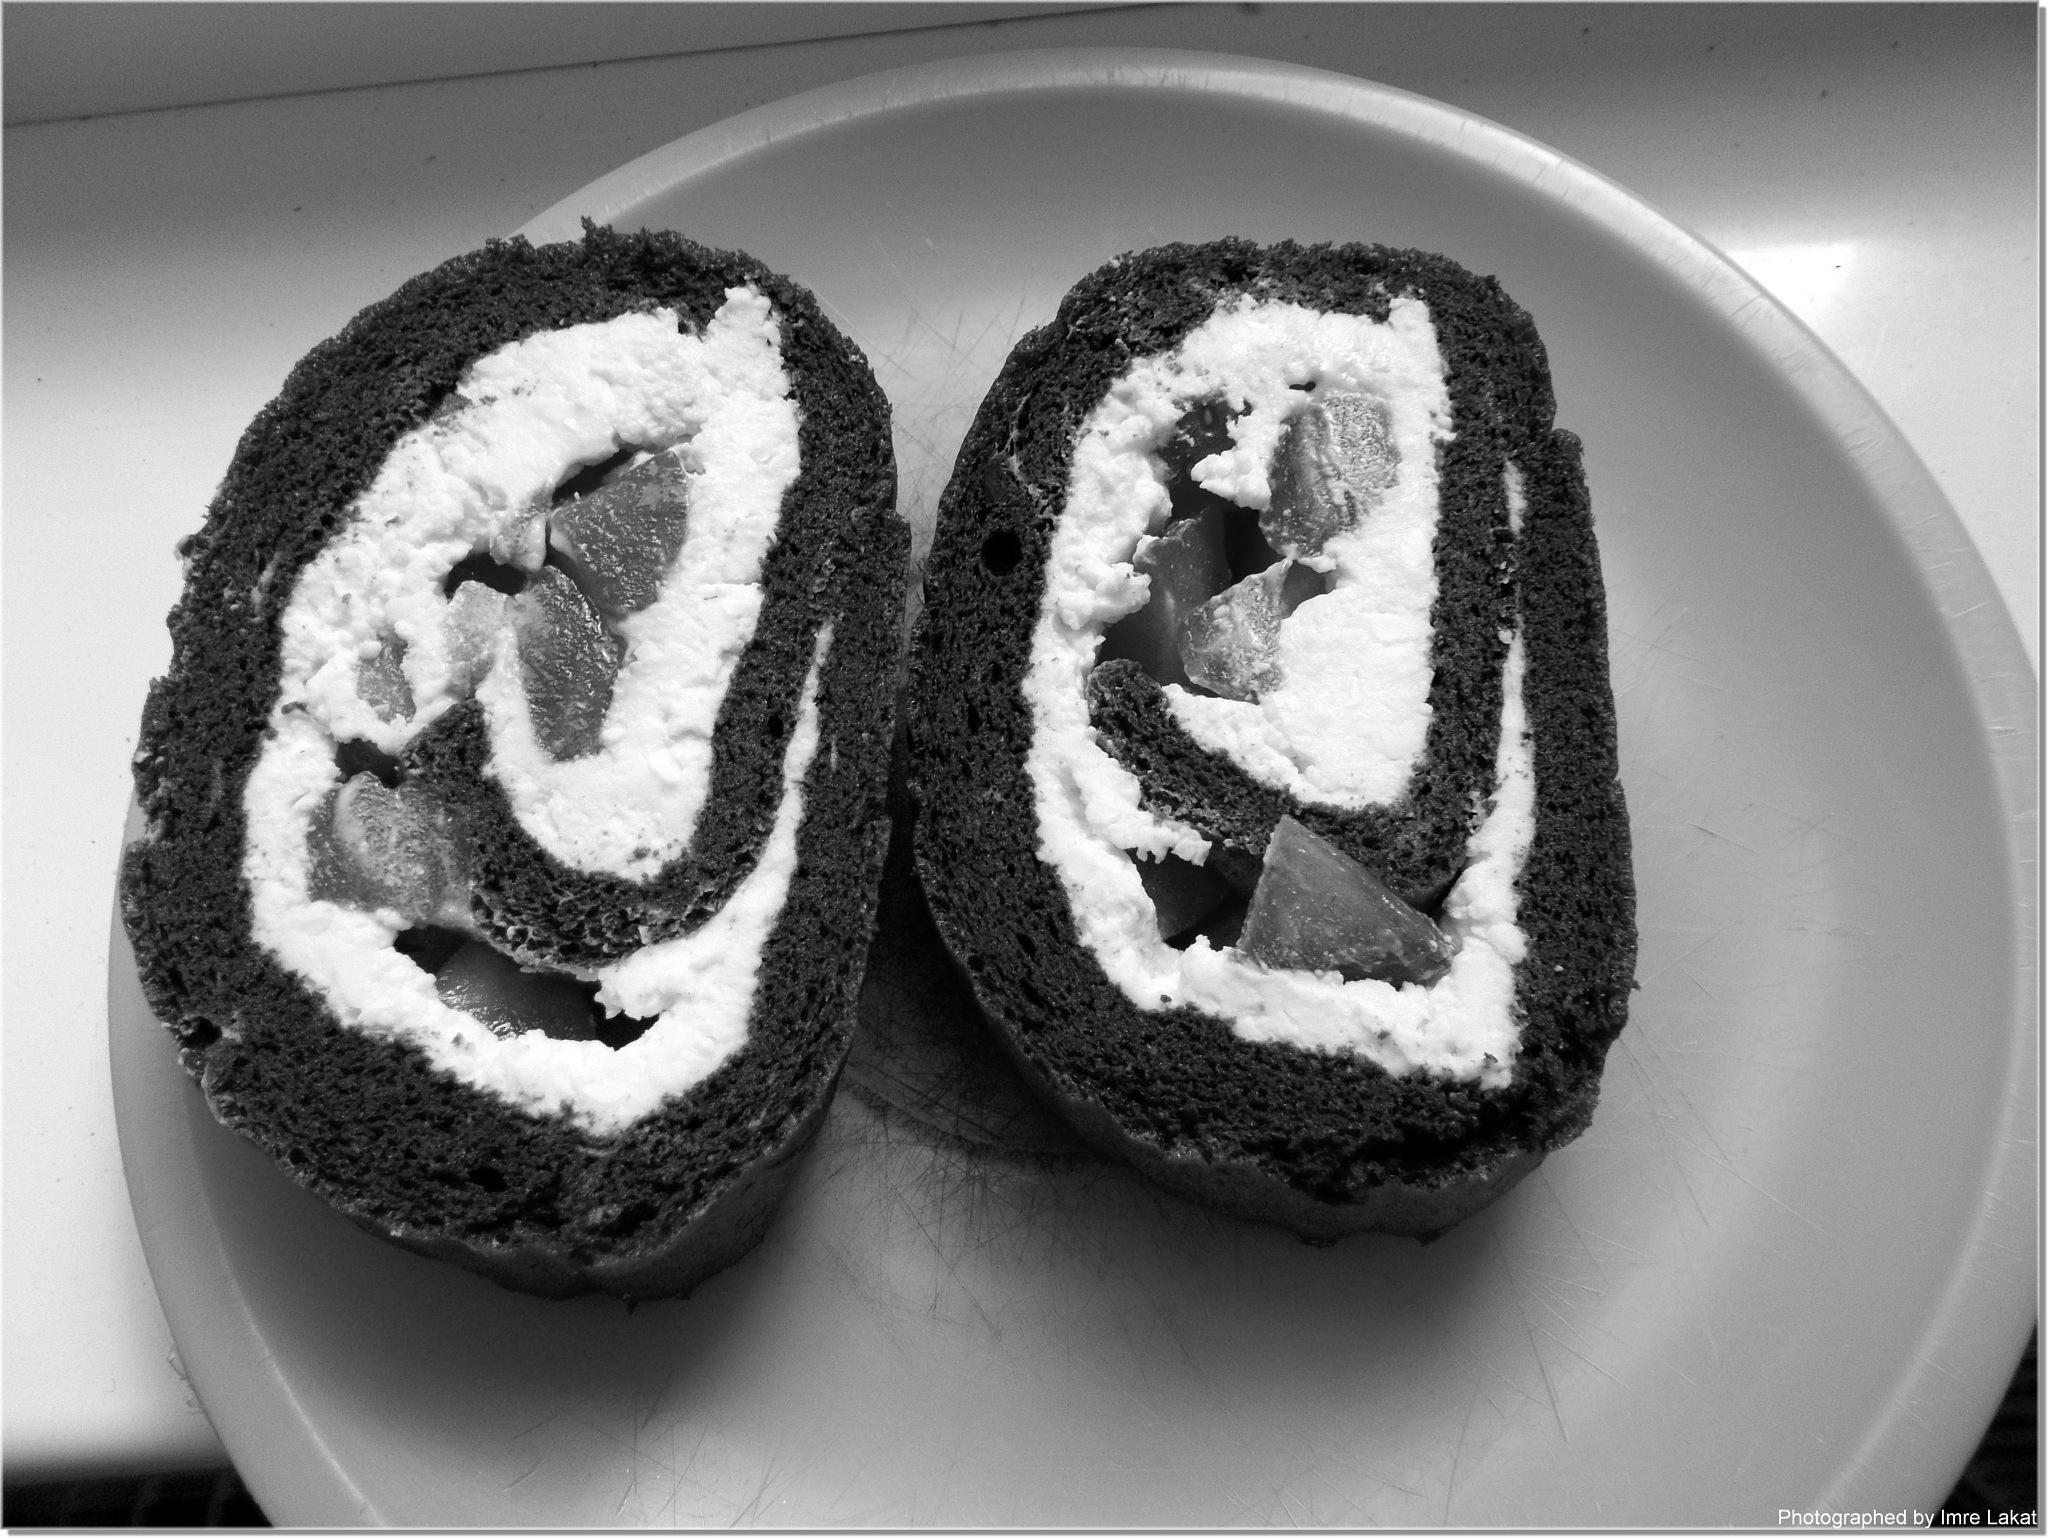 Food by Imre Lakat